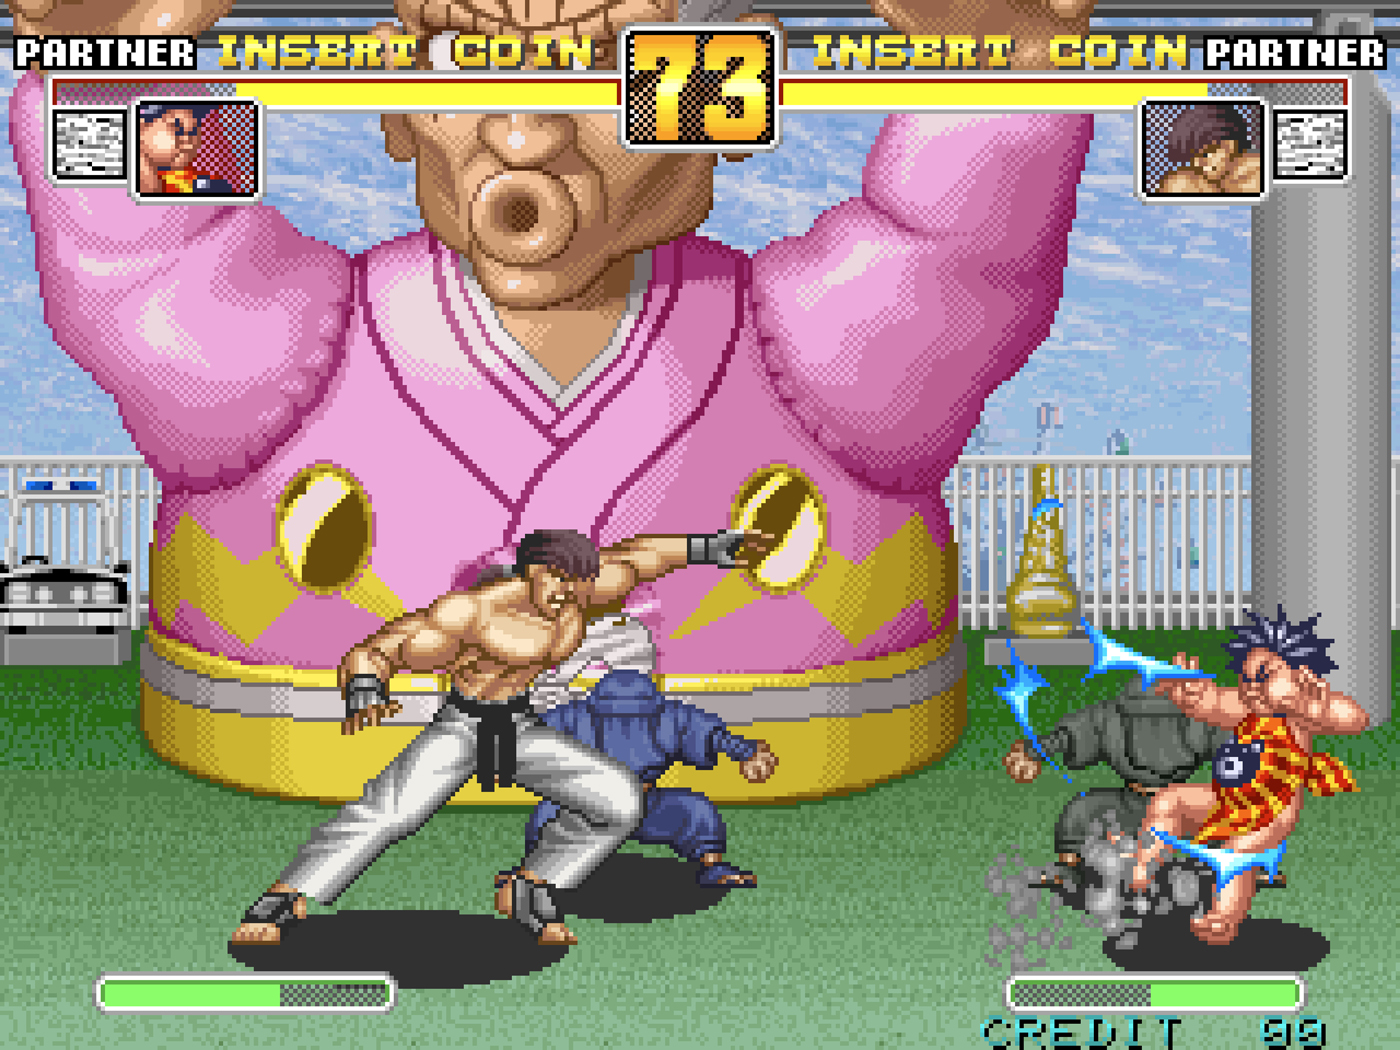 Toshi Omagari, Arcade Game Typography